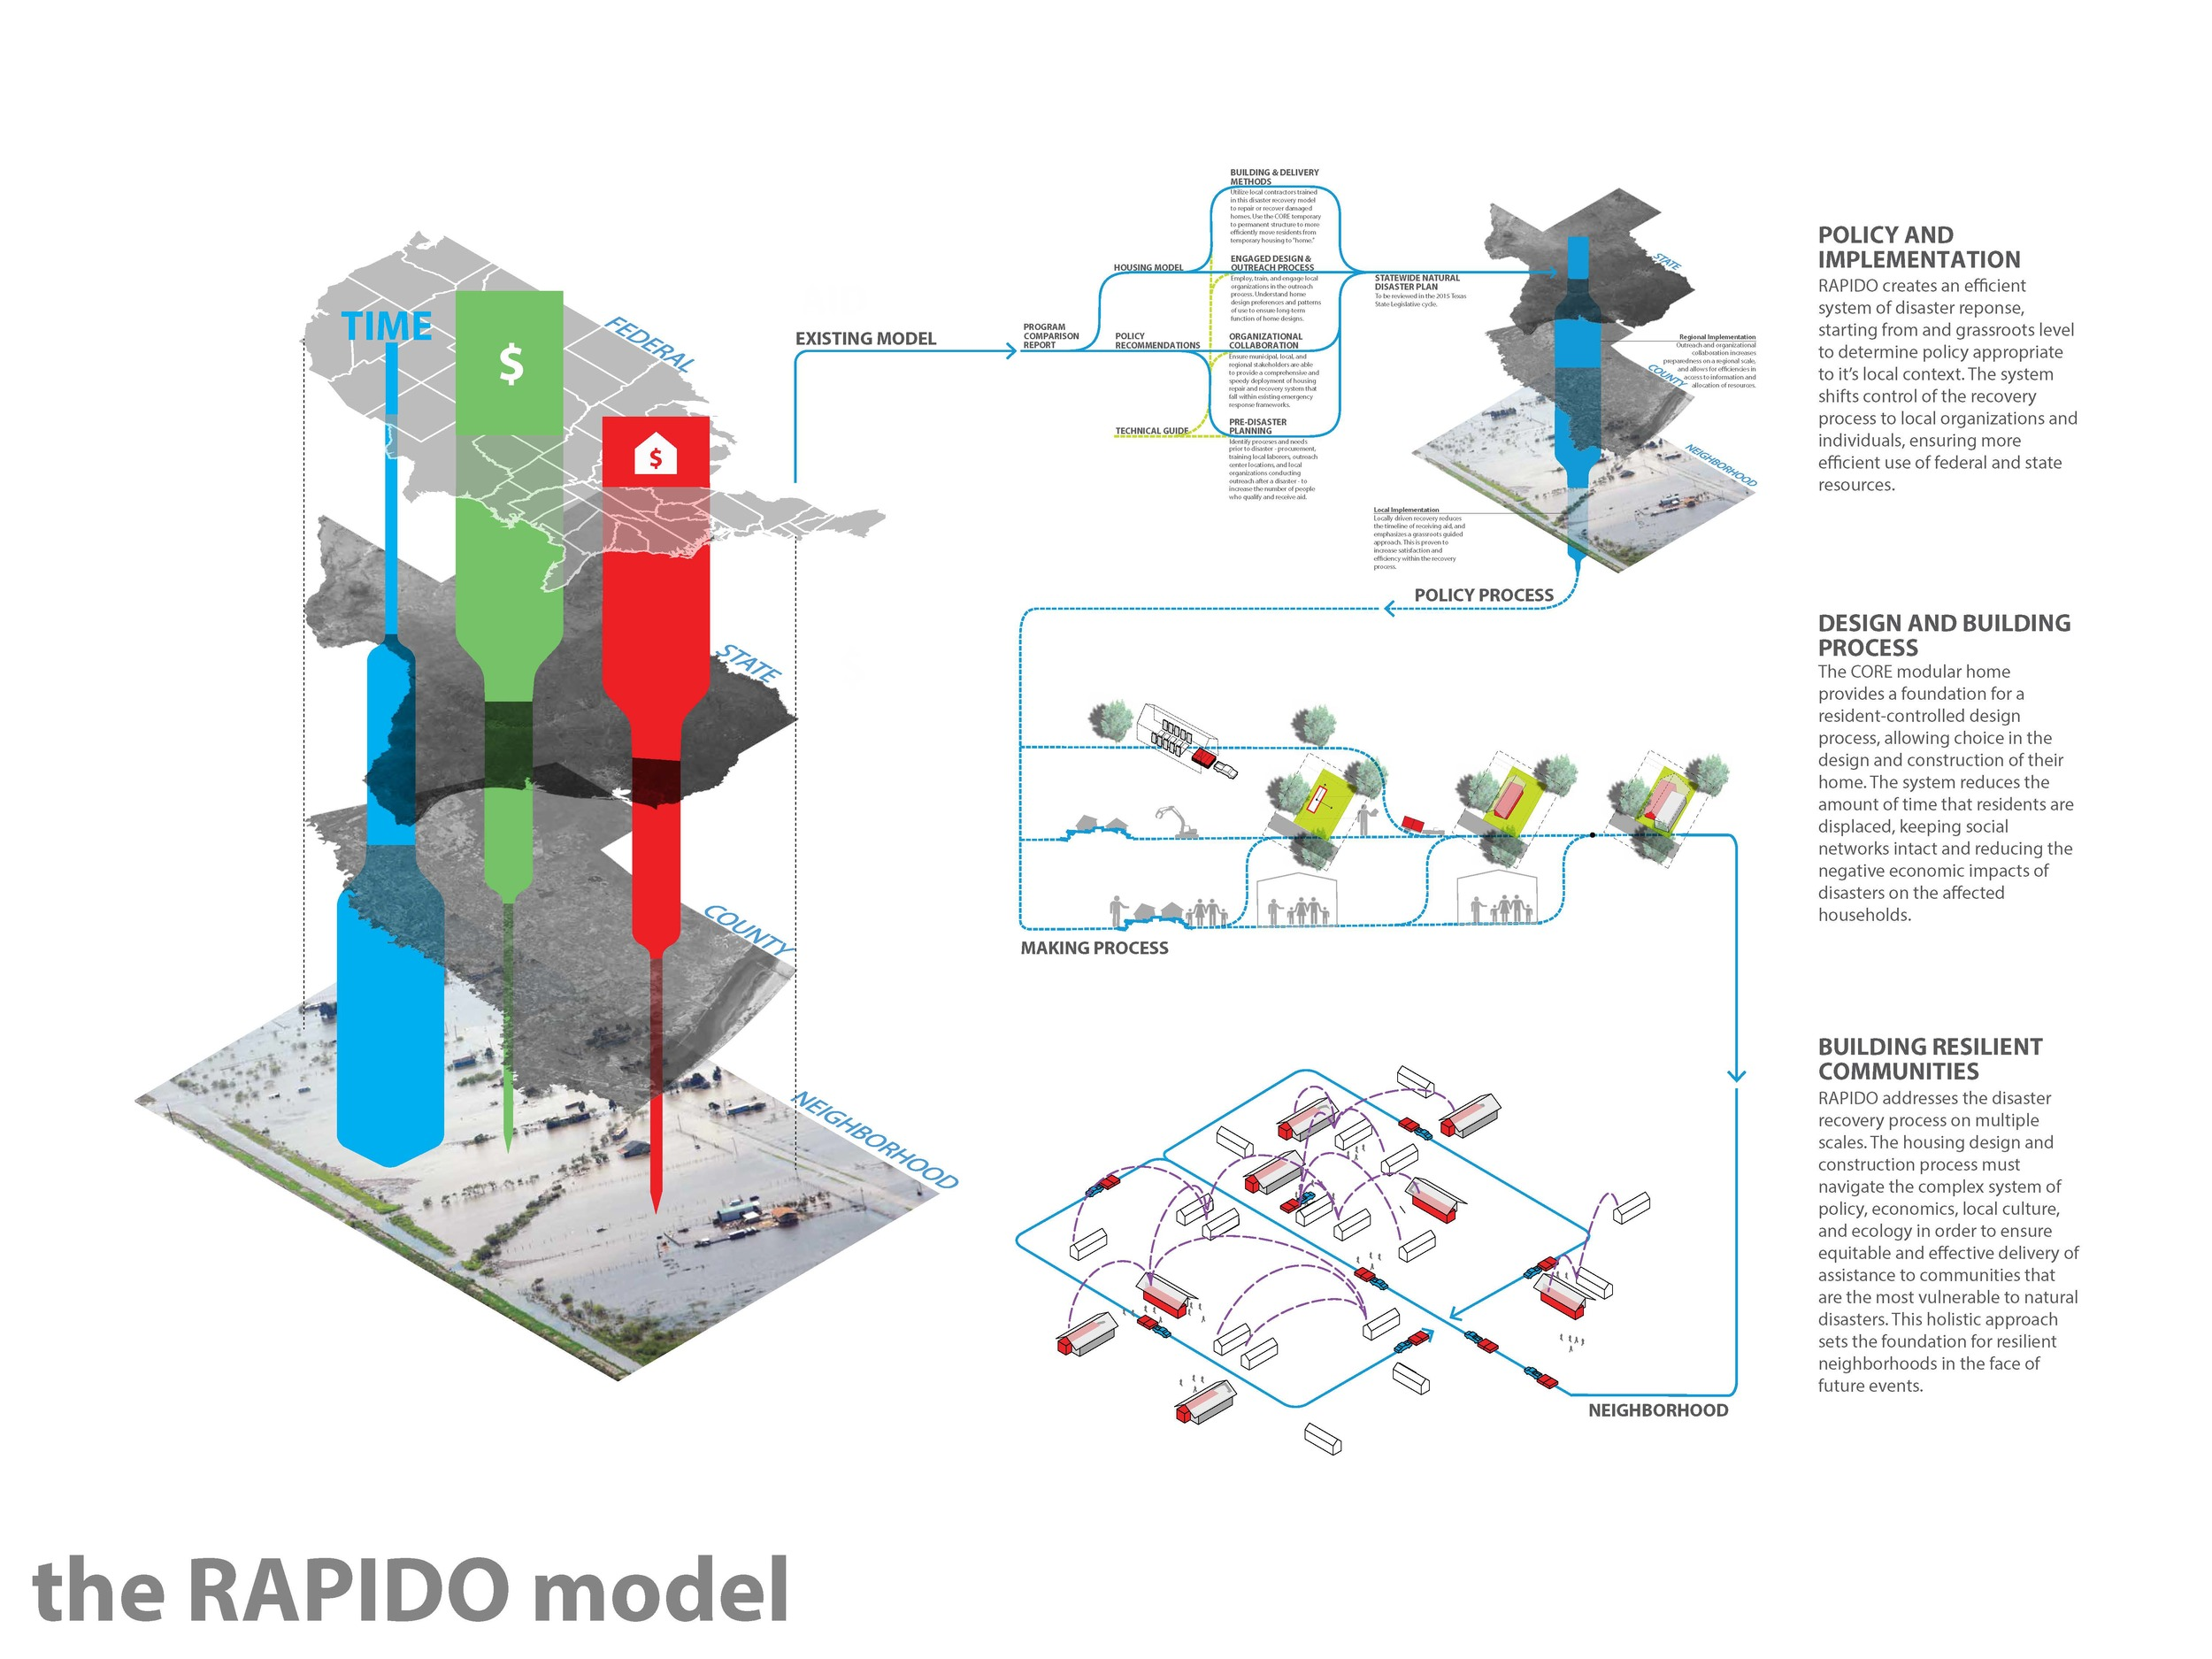 09_The RAPIDO Model.jpg